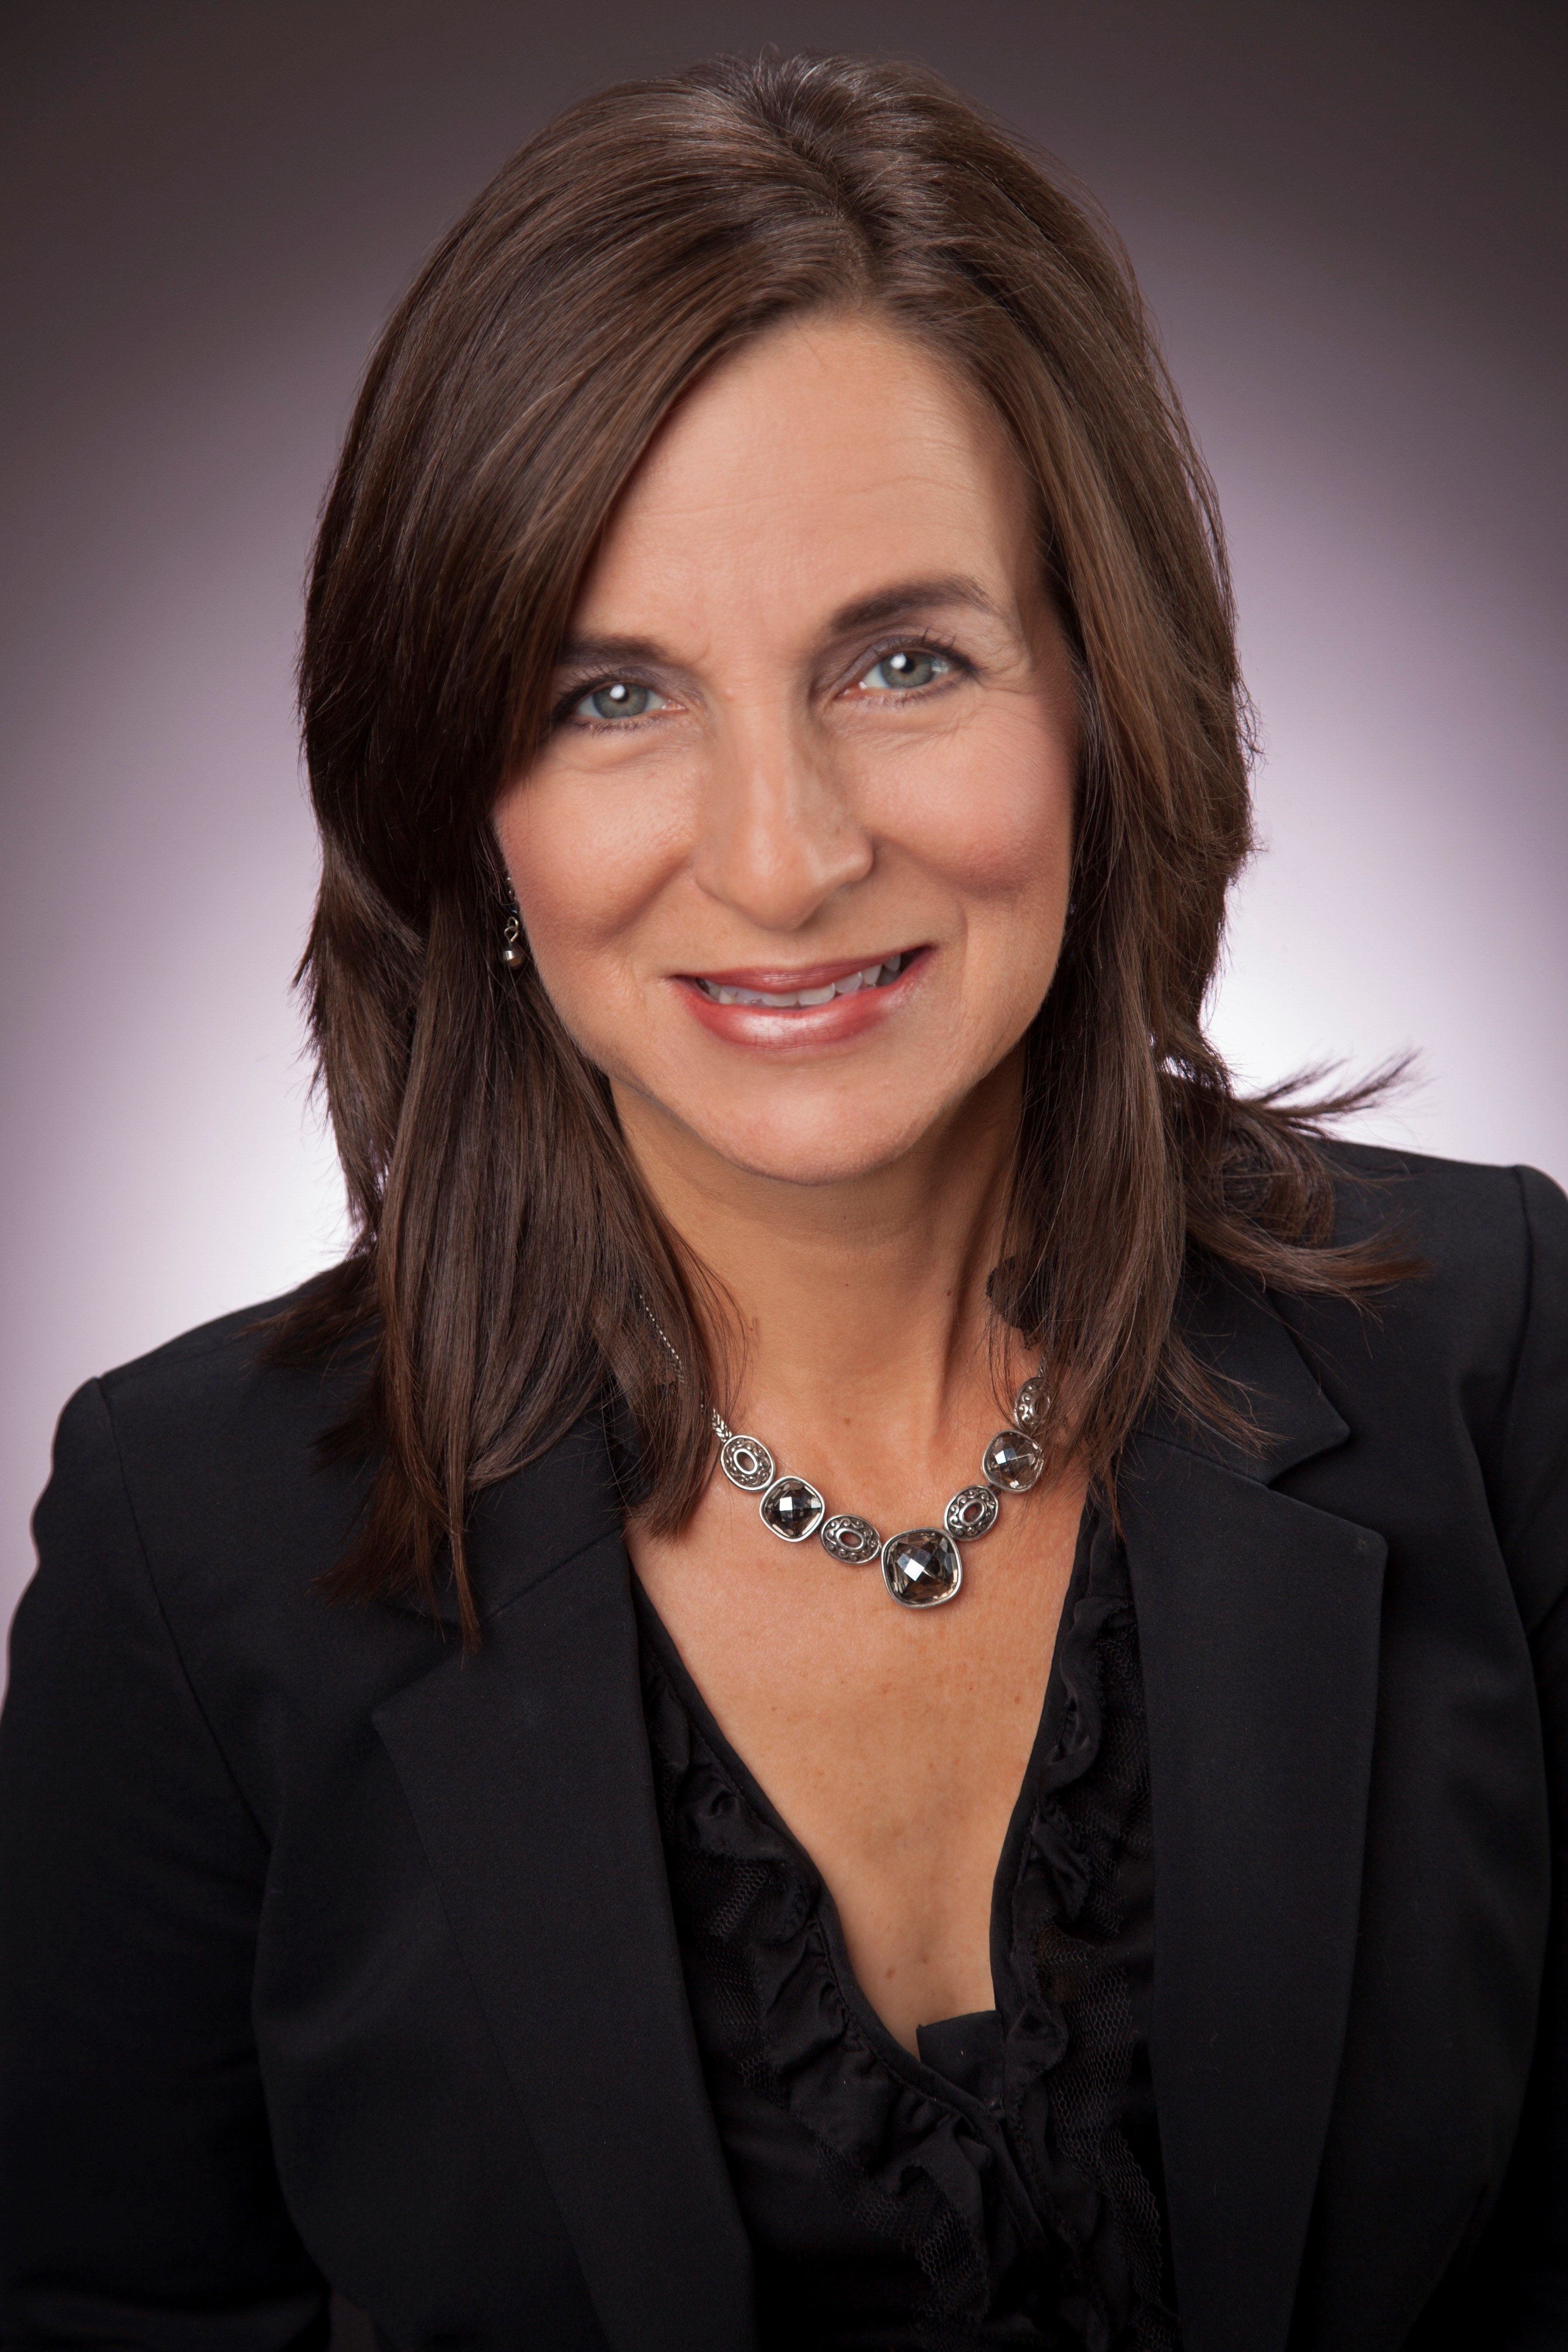 Hall-Dawson CASA Welcomes Joy Green as New Development Specialist